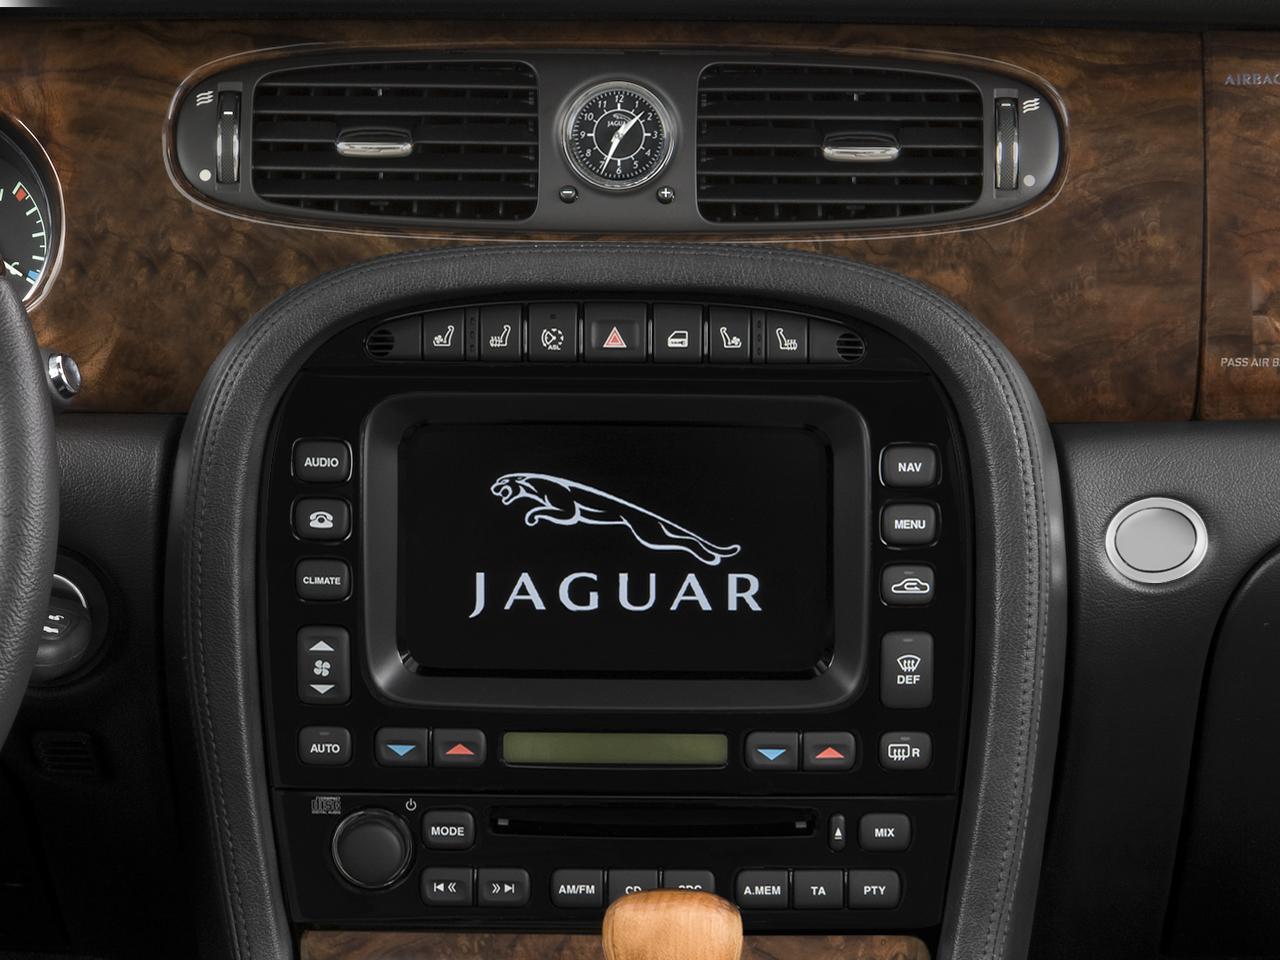 2008 jaguar xj vanden plas jaguar luxury sedan review. Black Bedroom Furniture Sets. Home Design Ideas